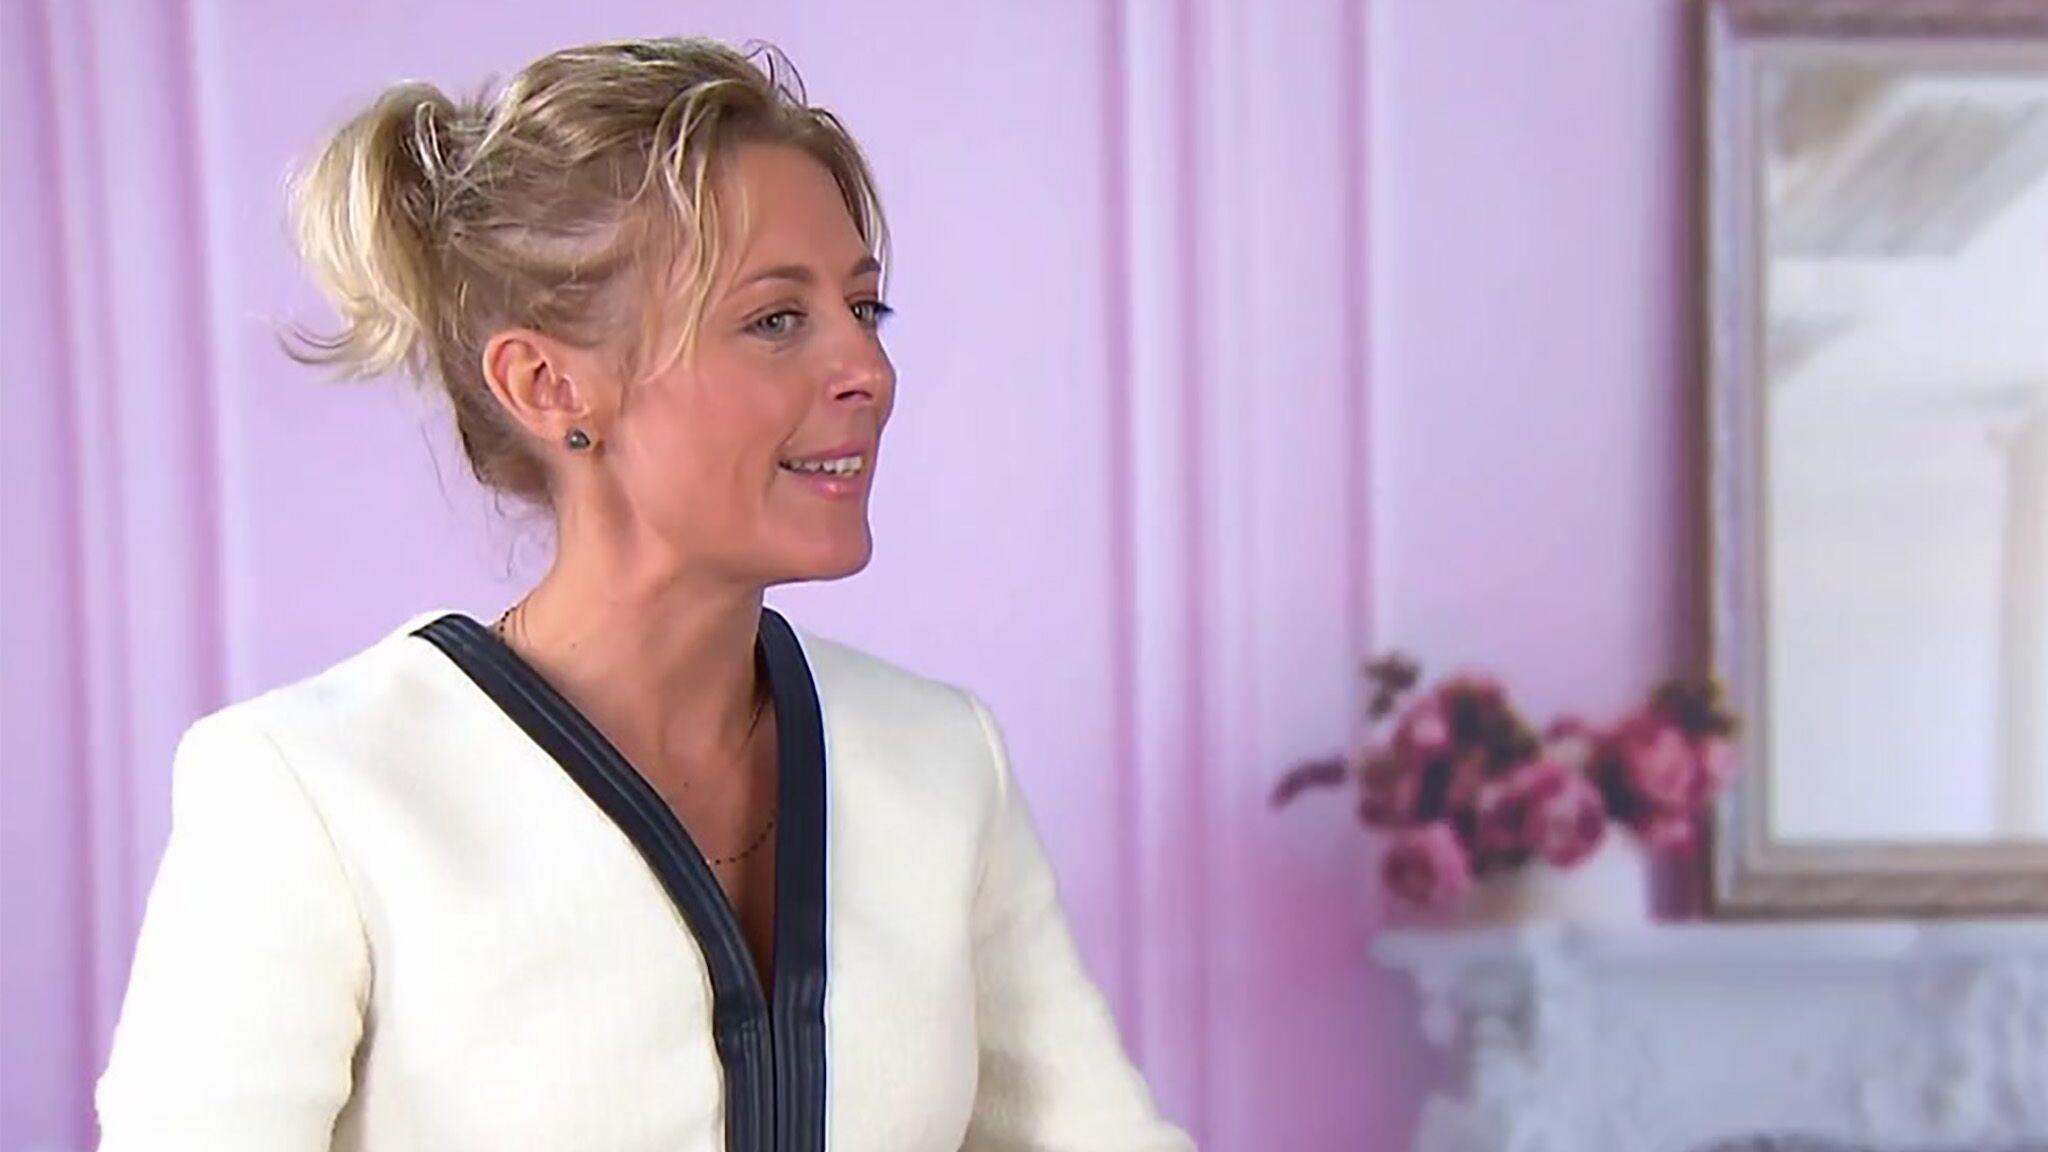 VIDEO Les Reines du shopping : une candidate « trop sexy » subjugue ses rivales